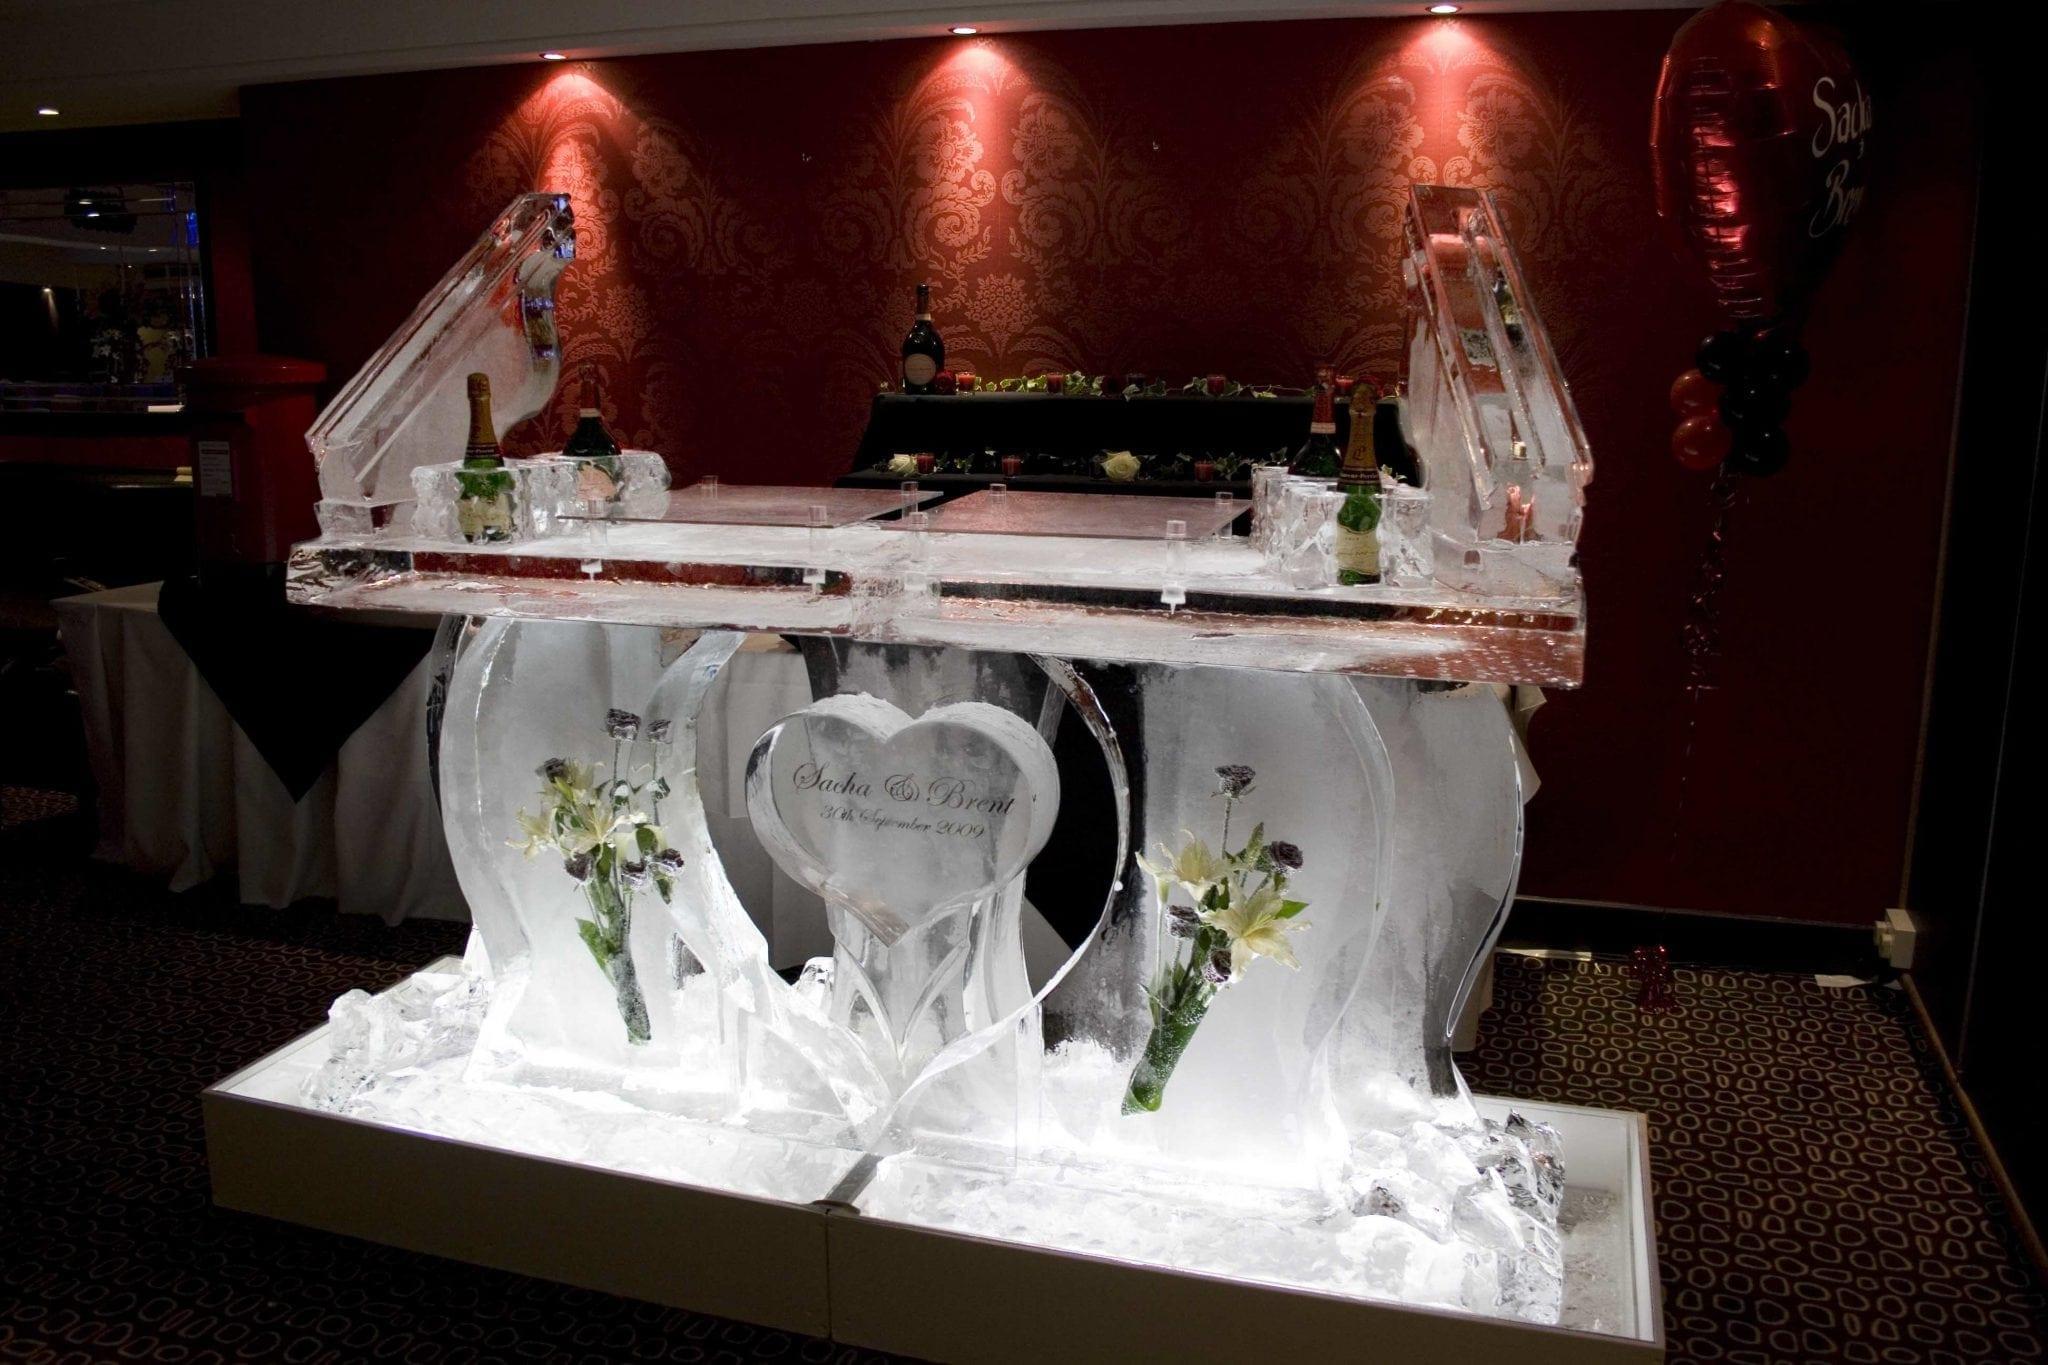 Ice Sculpture Wedding Decorations A Unique Idea